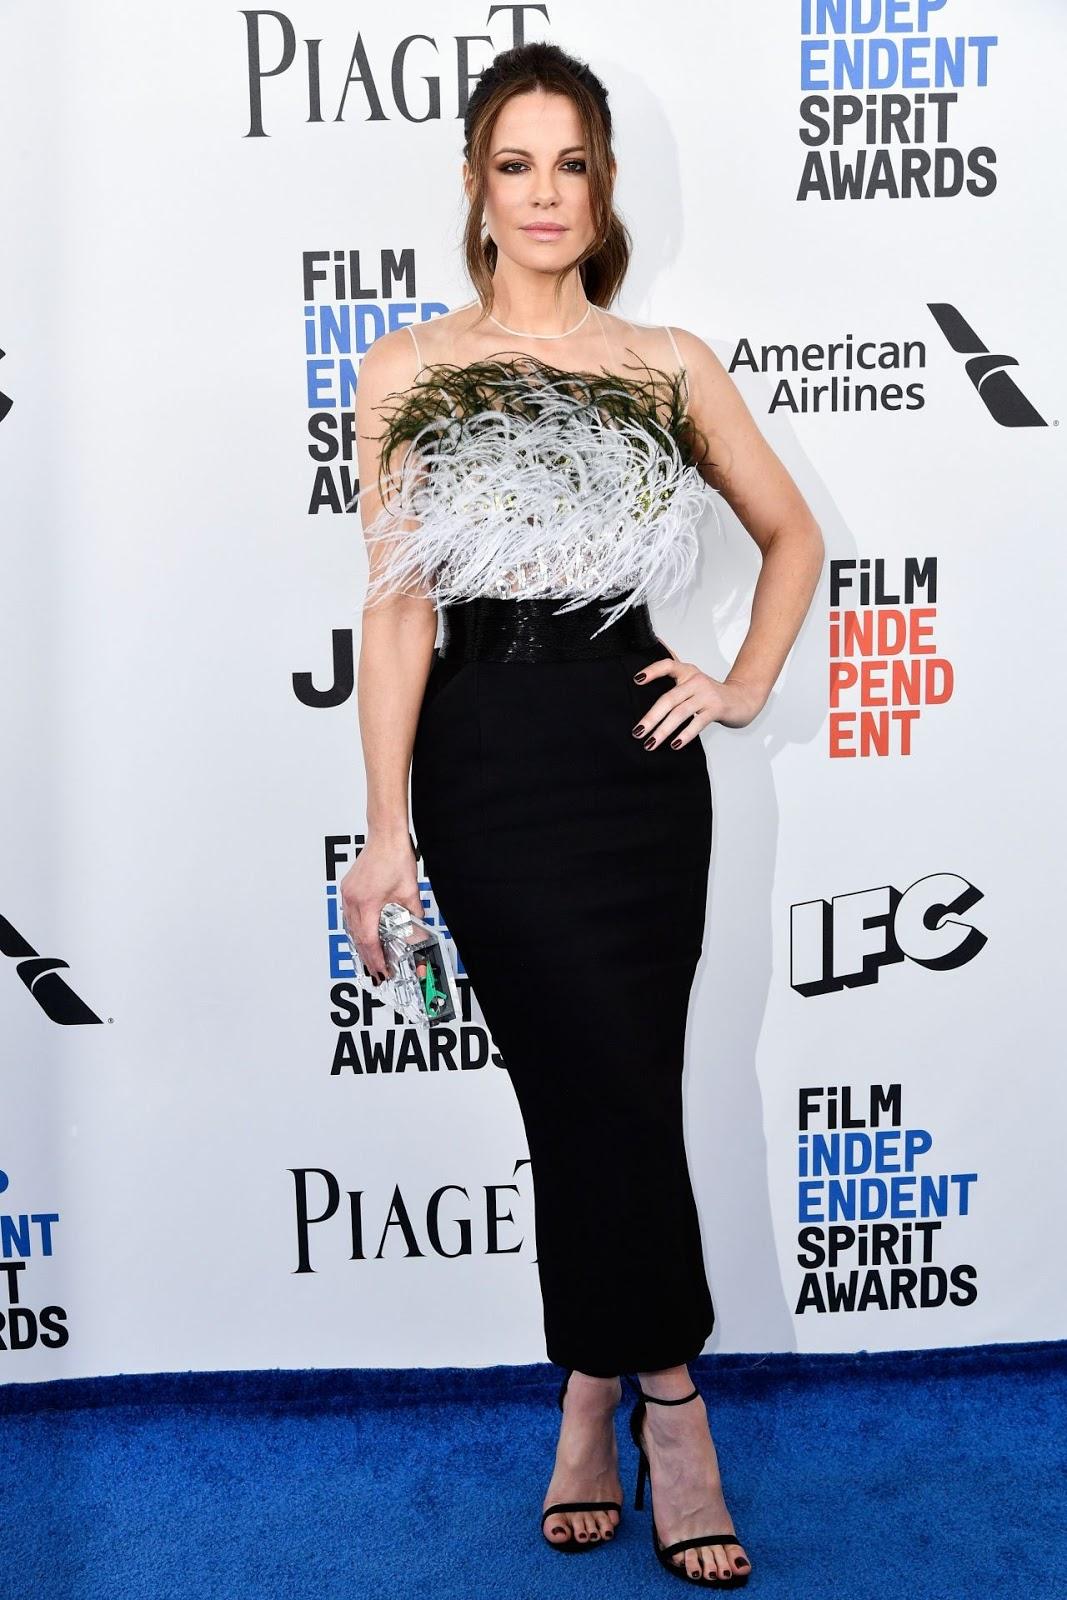 Kate Beckinsale is effortlessly chic at the 2017 Independent Spirit Awards